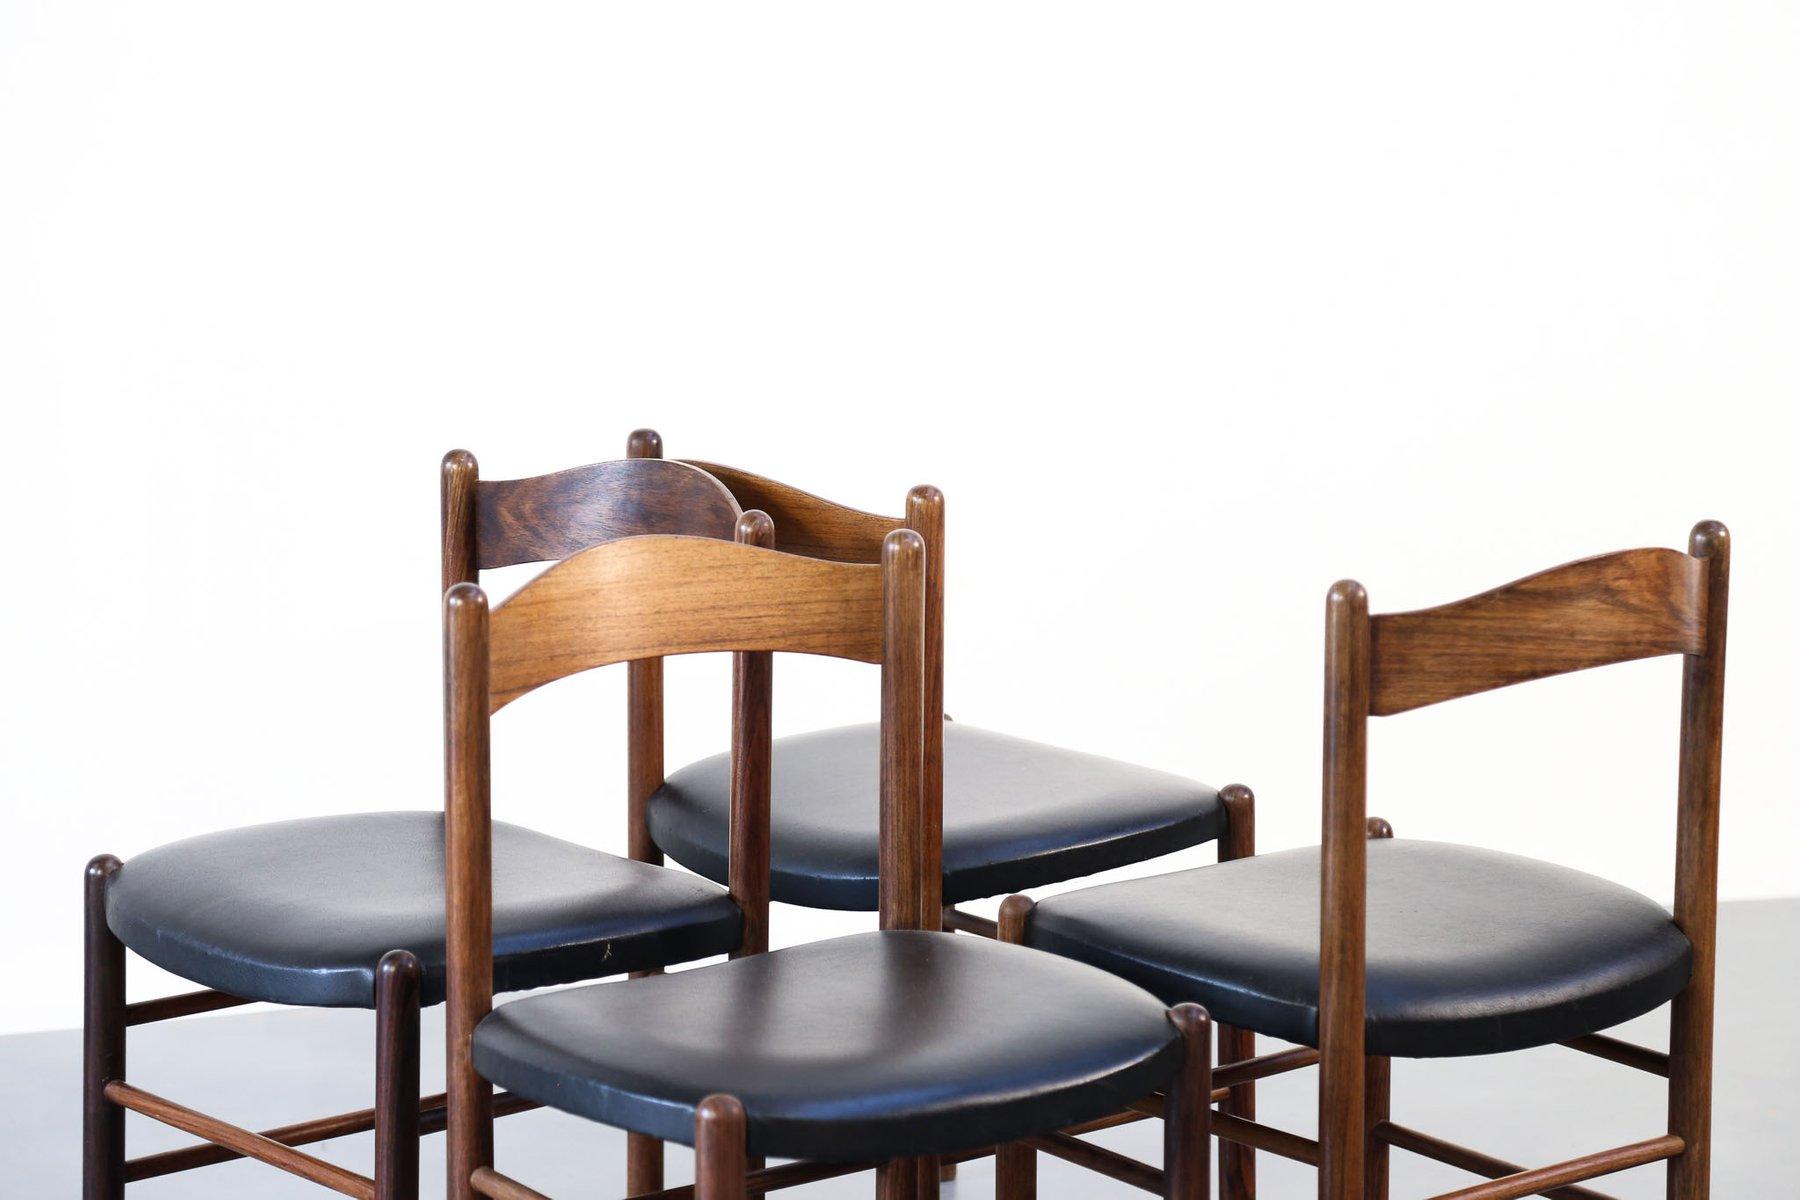 skandinavische st hle aus teak 1960er 4er set bei pamono kaufen. Black Bedroom Furniture Sets. Home Design Ideas